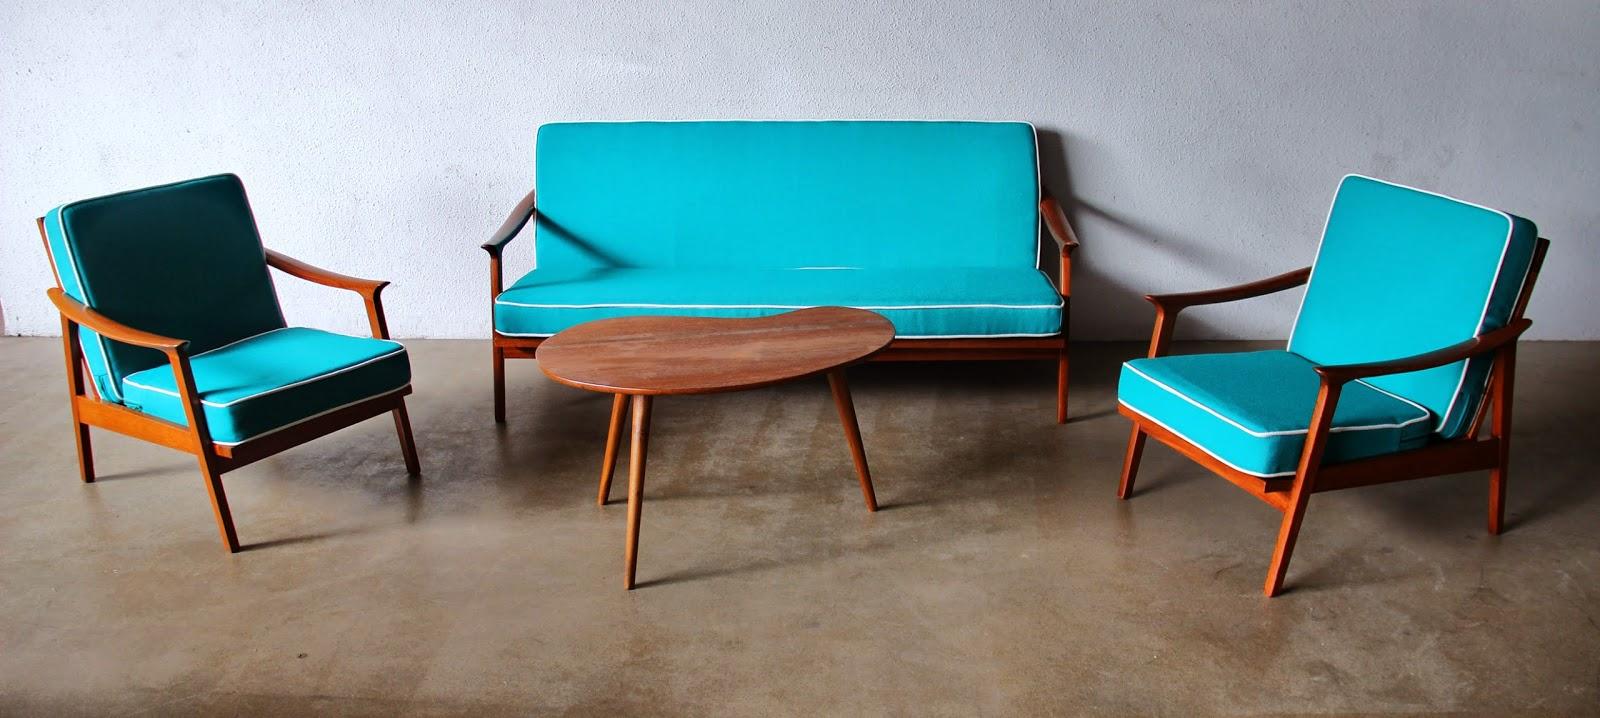 Cheap Retro Furniture. inexpensive retro furniture. cheap vintage ...